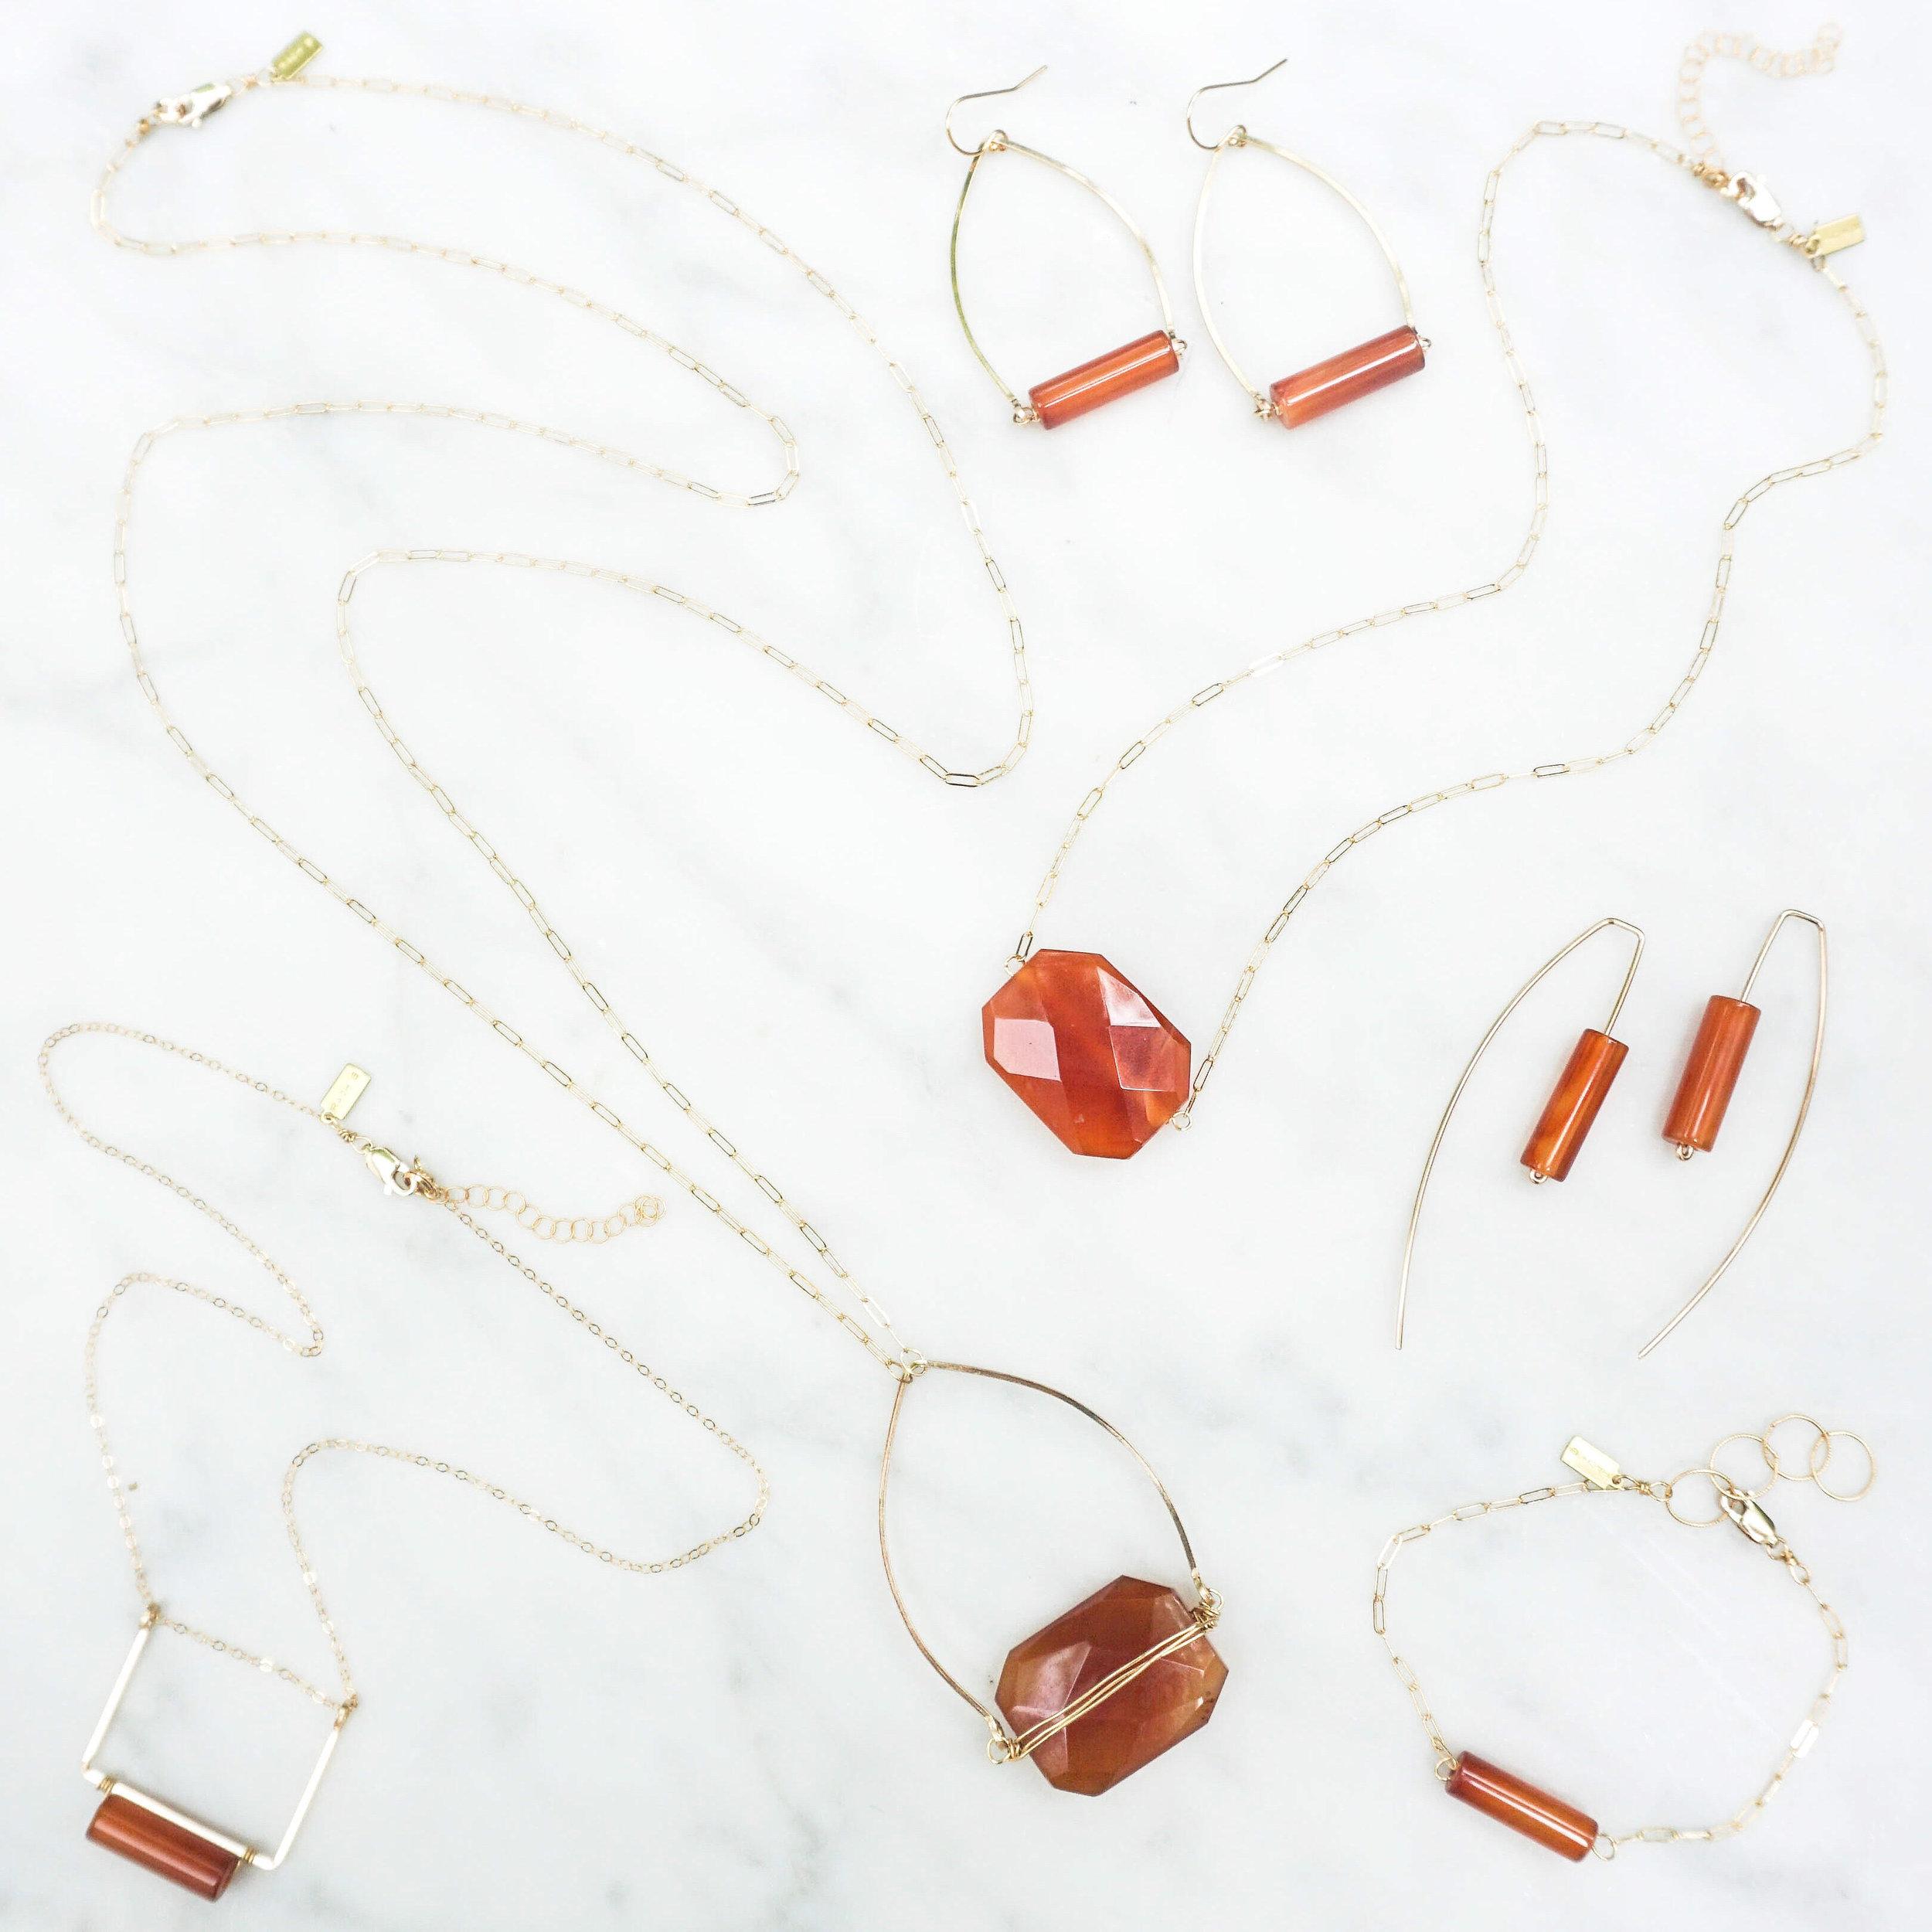 University of Texas UT Burnt Orange Carnelian Jewelry + Accessories  $45-$110